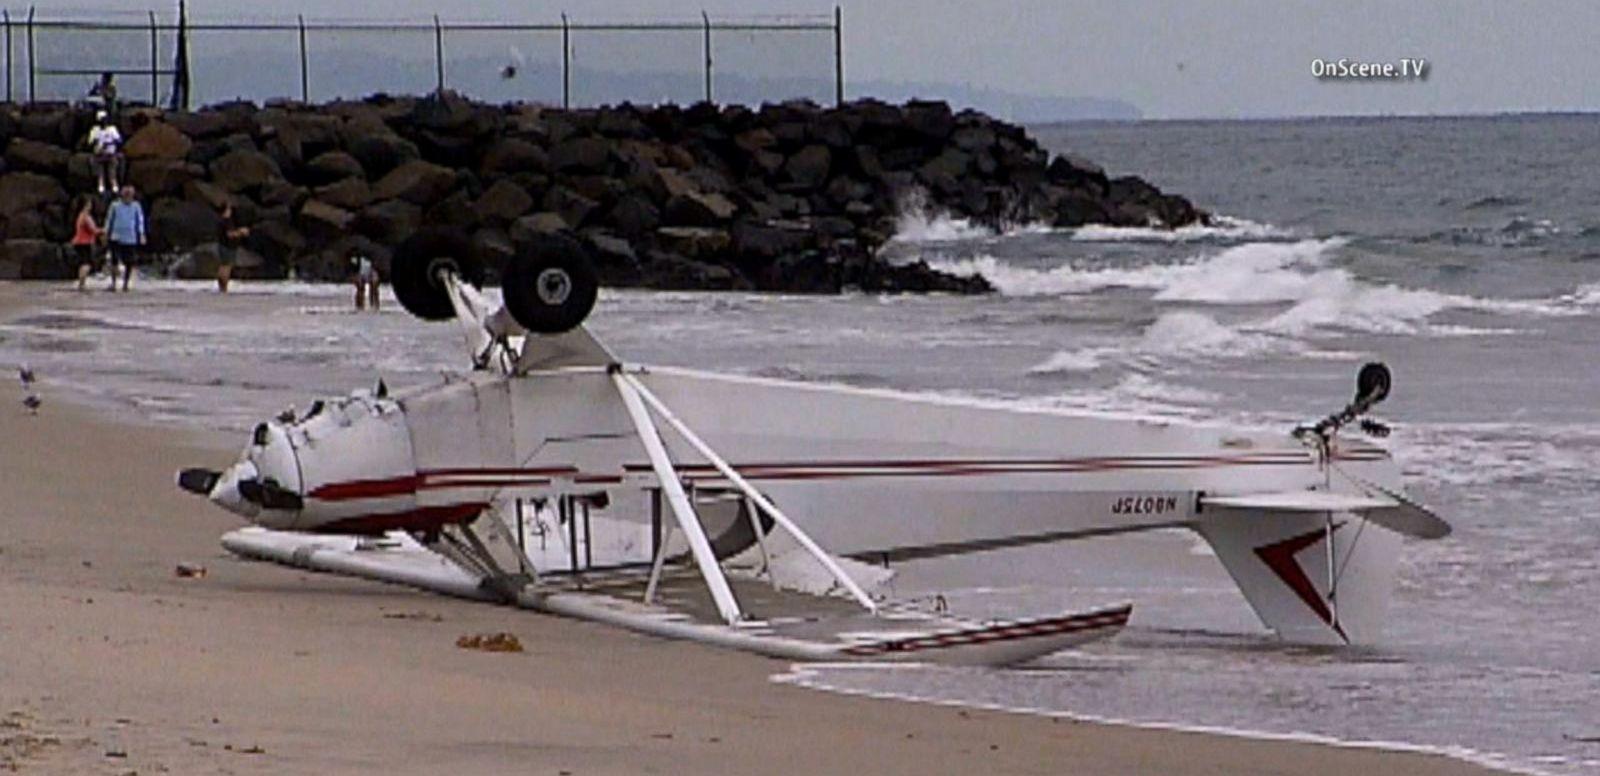 VIDEO: 12-Year-Old Injured as Single-Engine Plane Crash Lands on California Beach